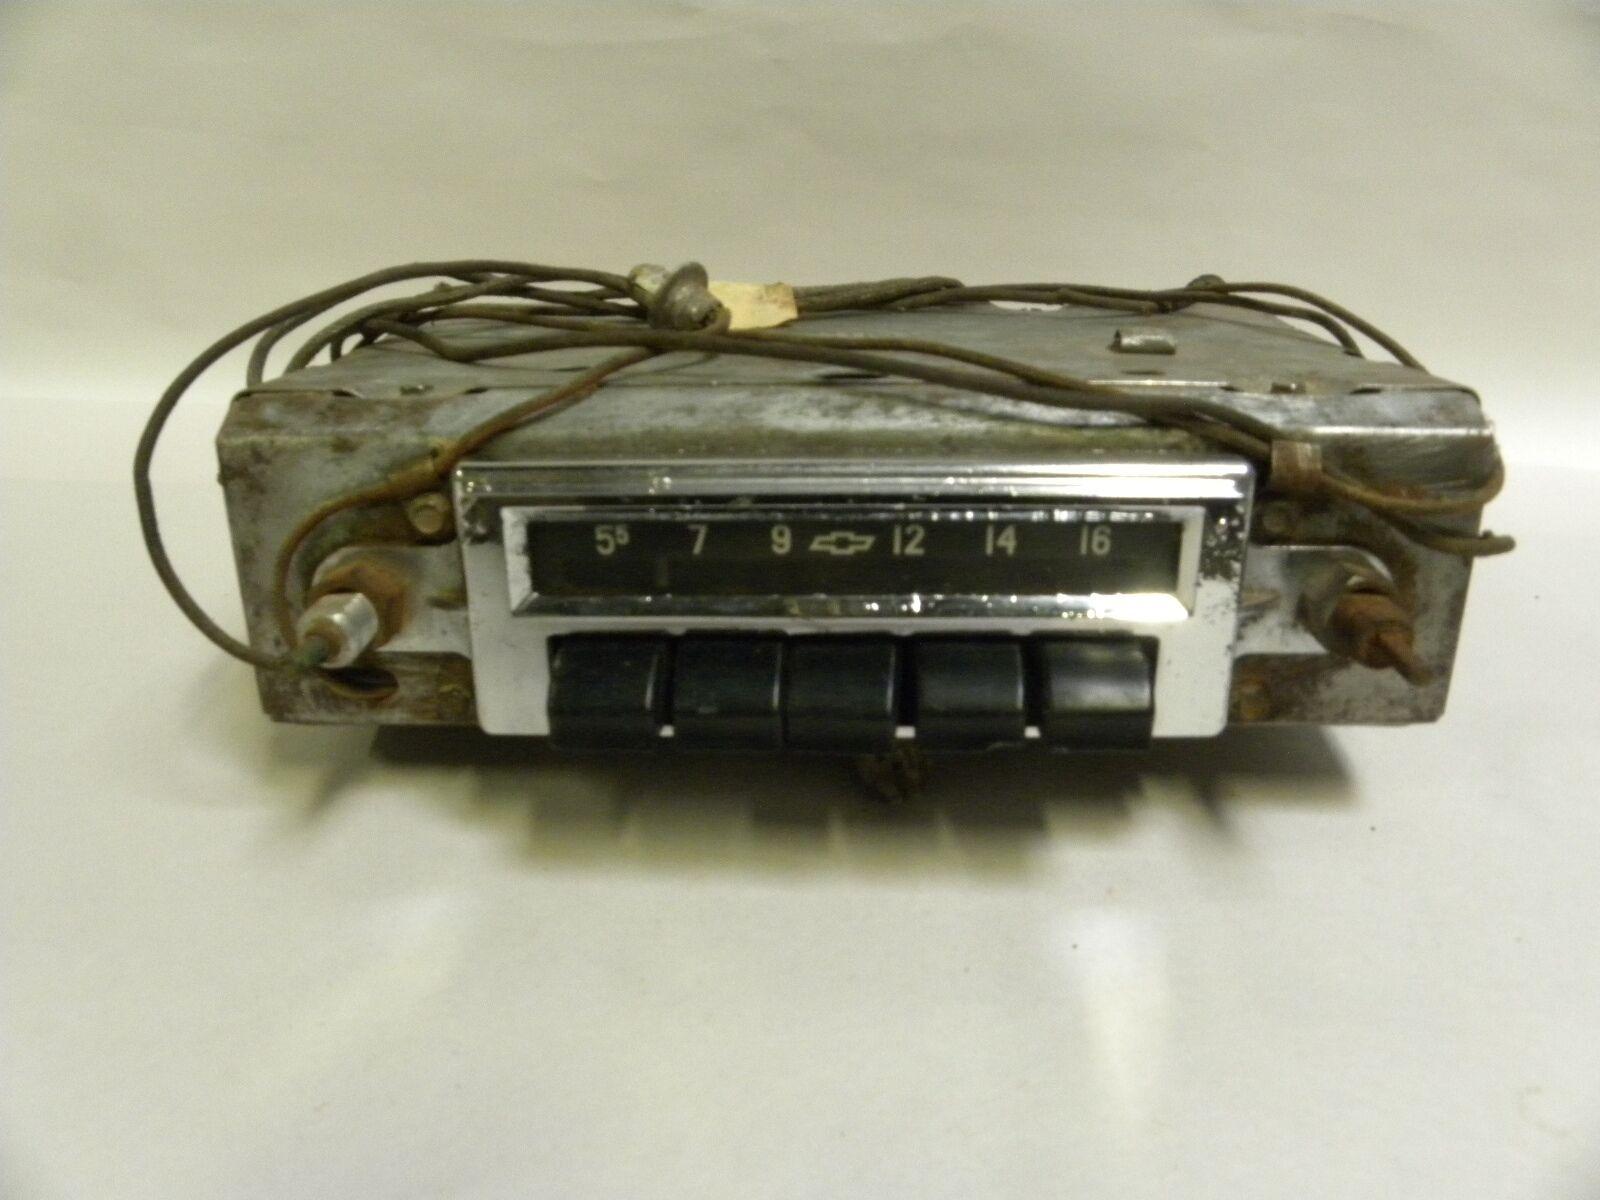 Vintage Chevy Chevrolet GM AM Car Auto Radio  (A10)